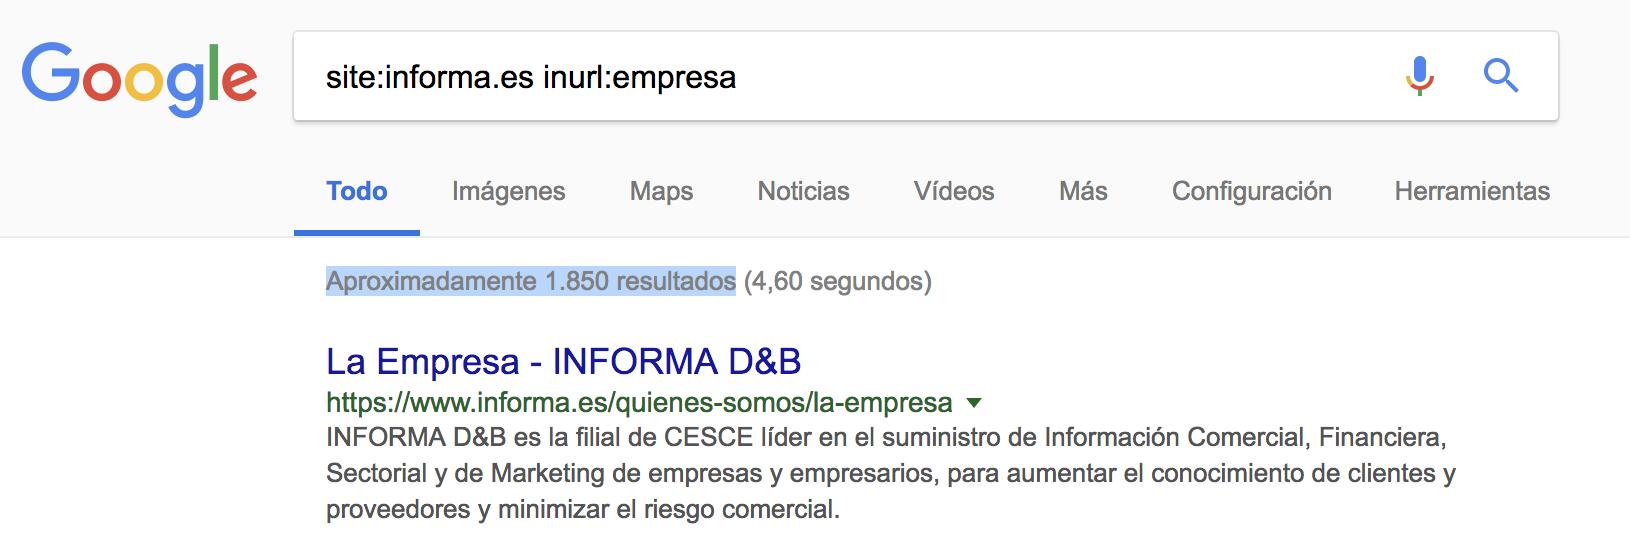 SEO para directorios - inurl:empresa